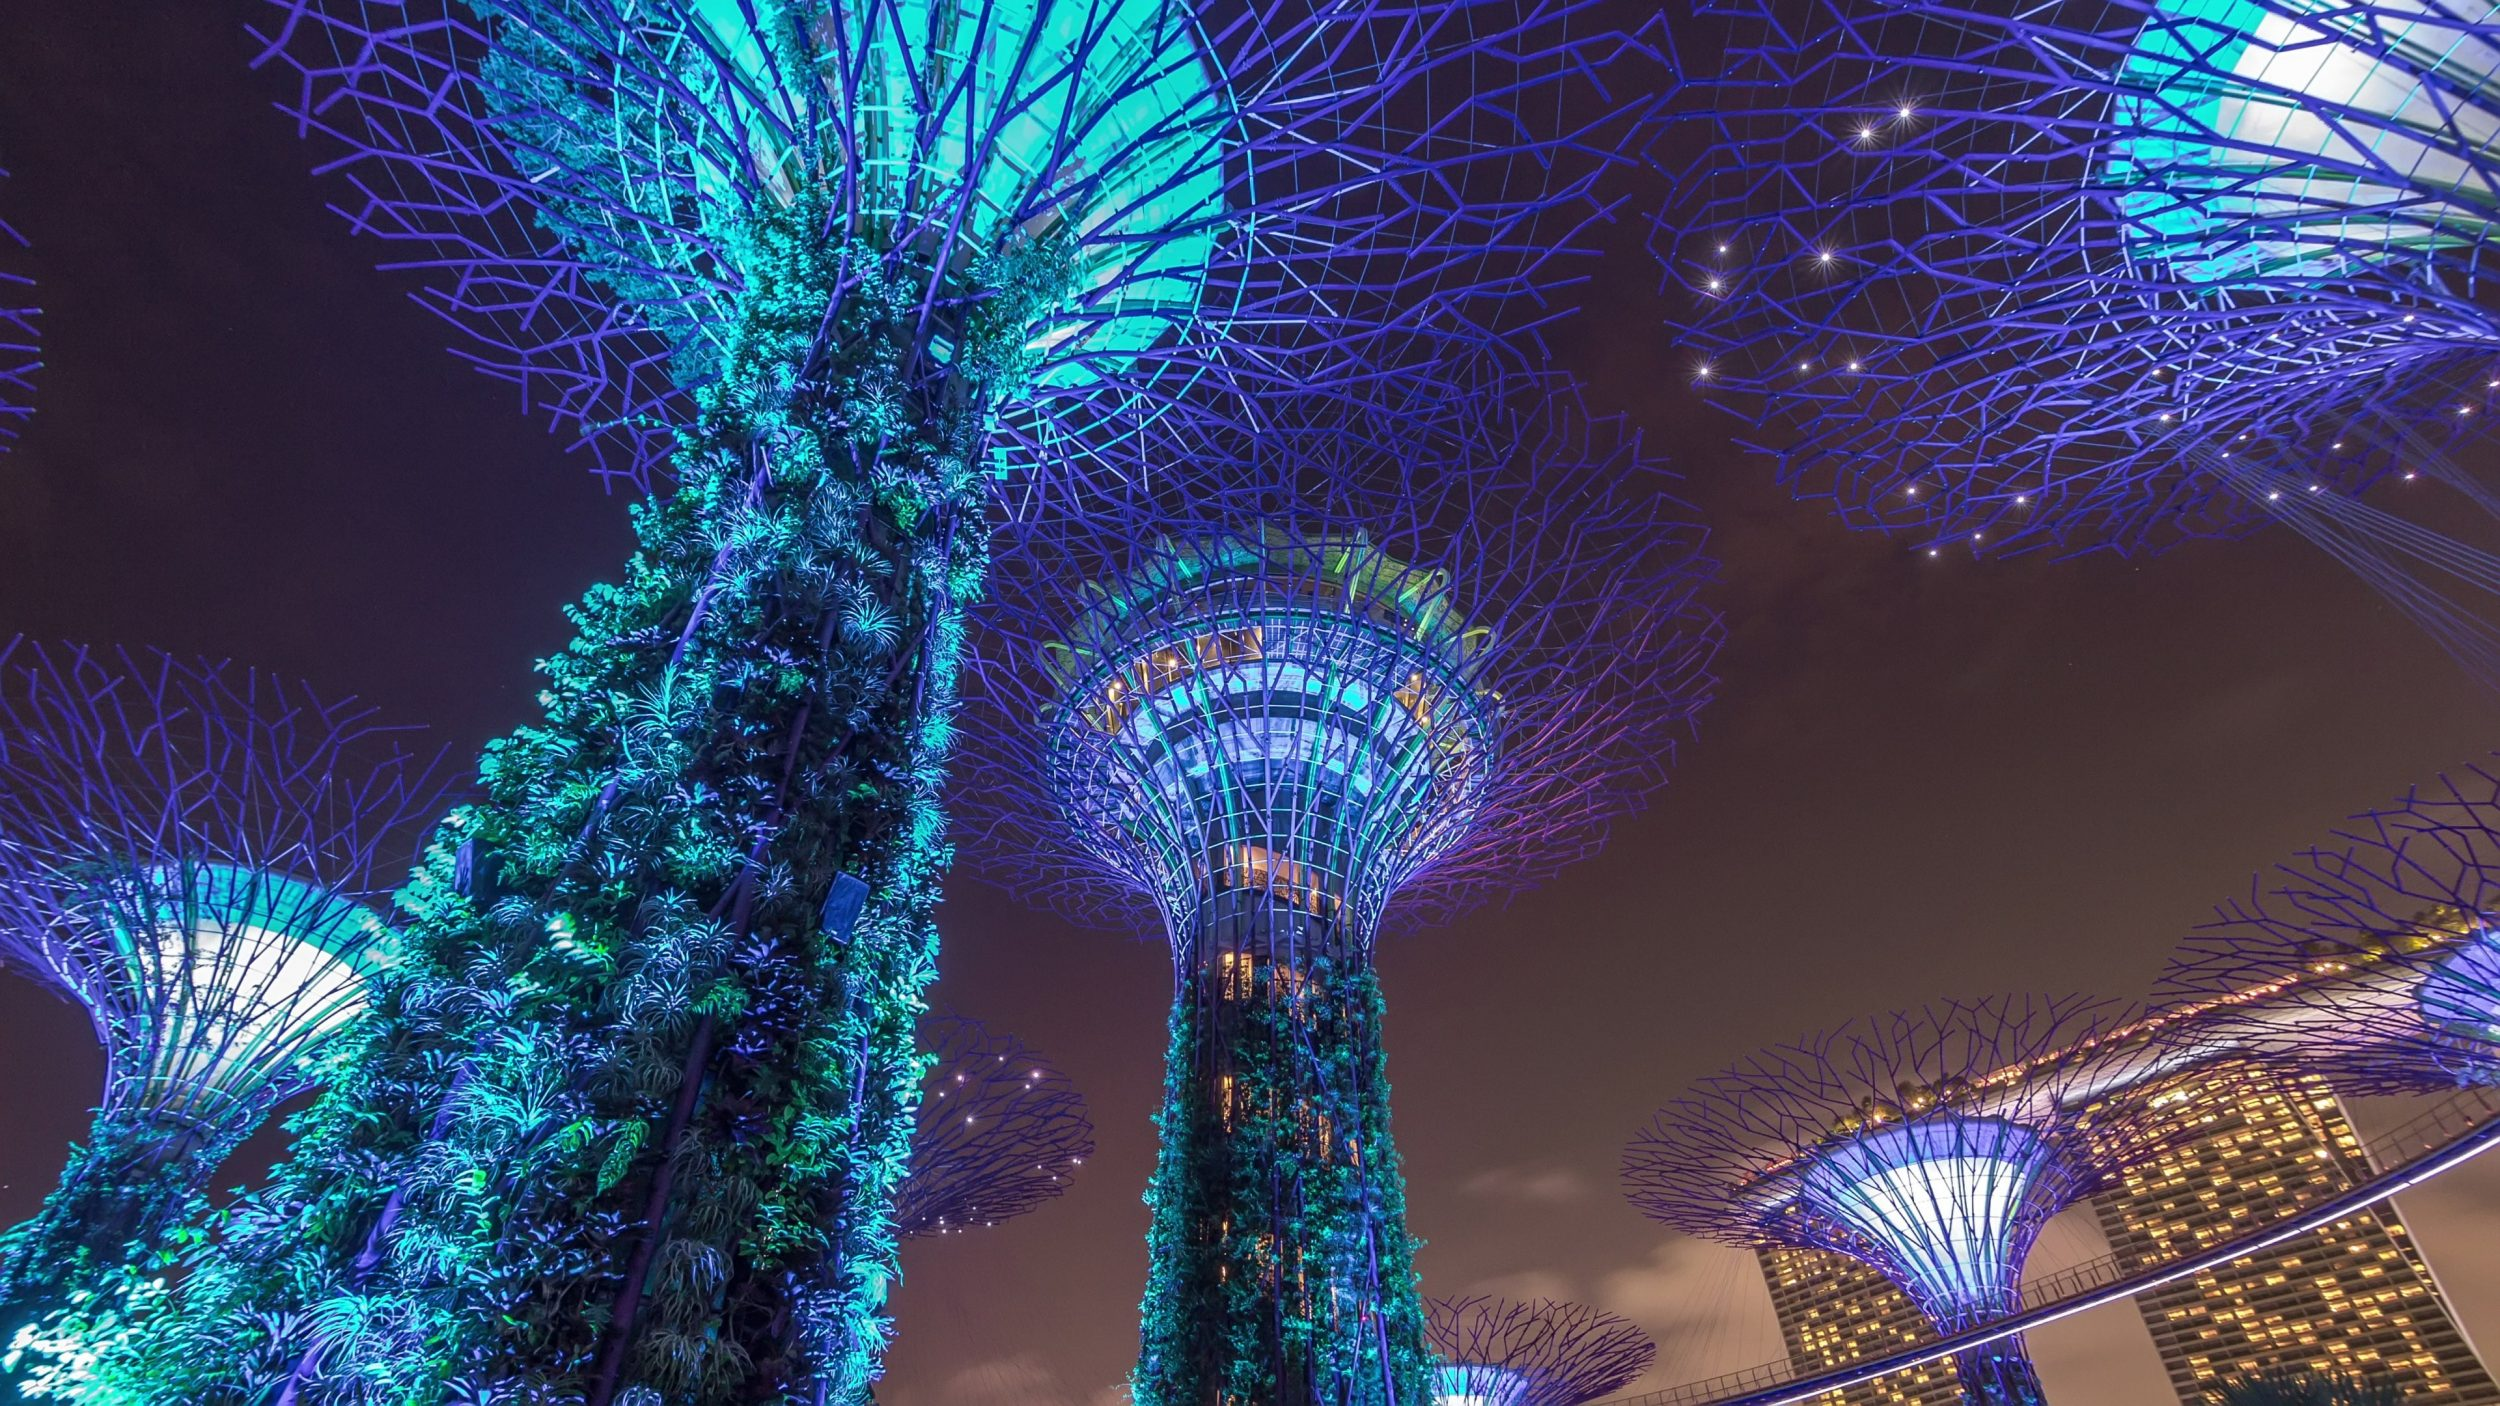 Asia, GTR Asia, Global trade, digitisation